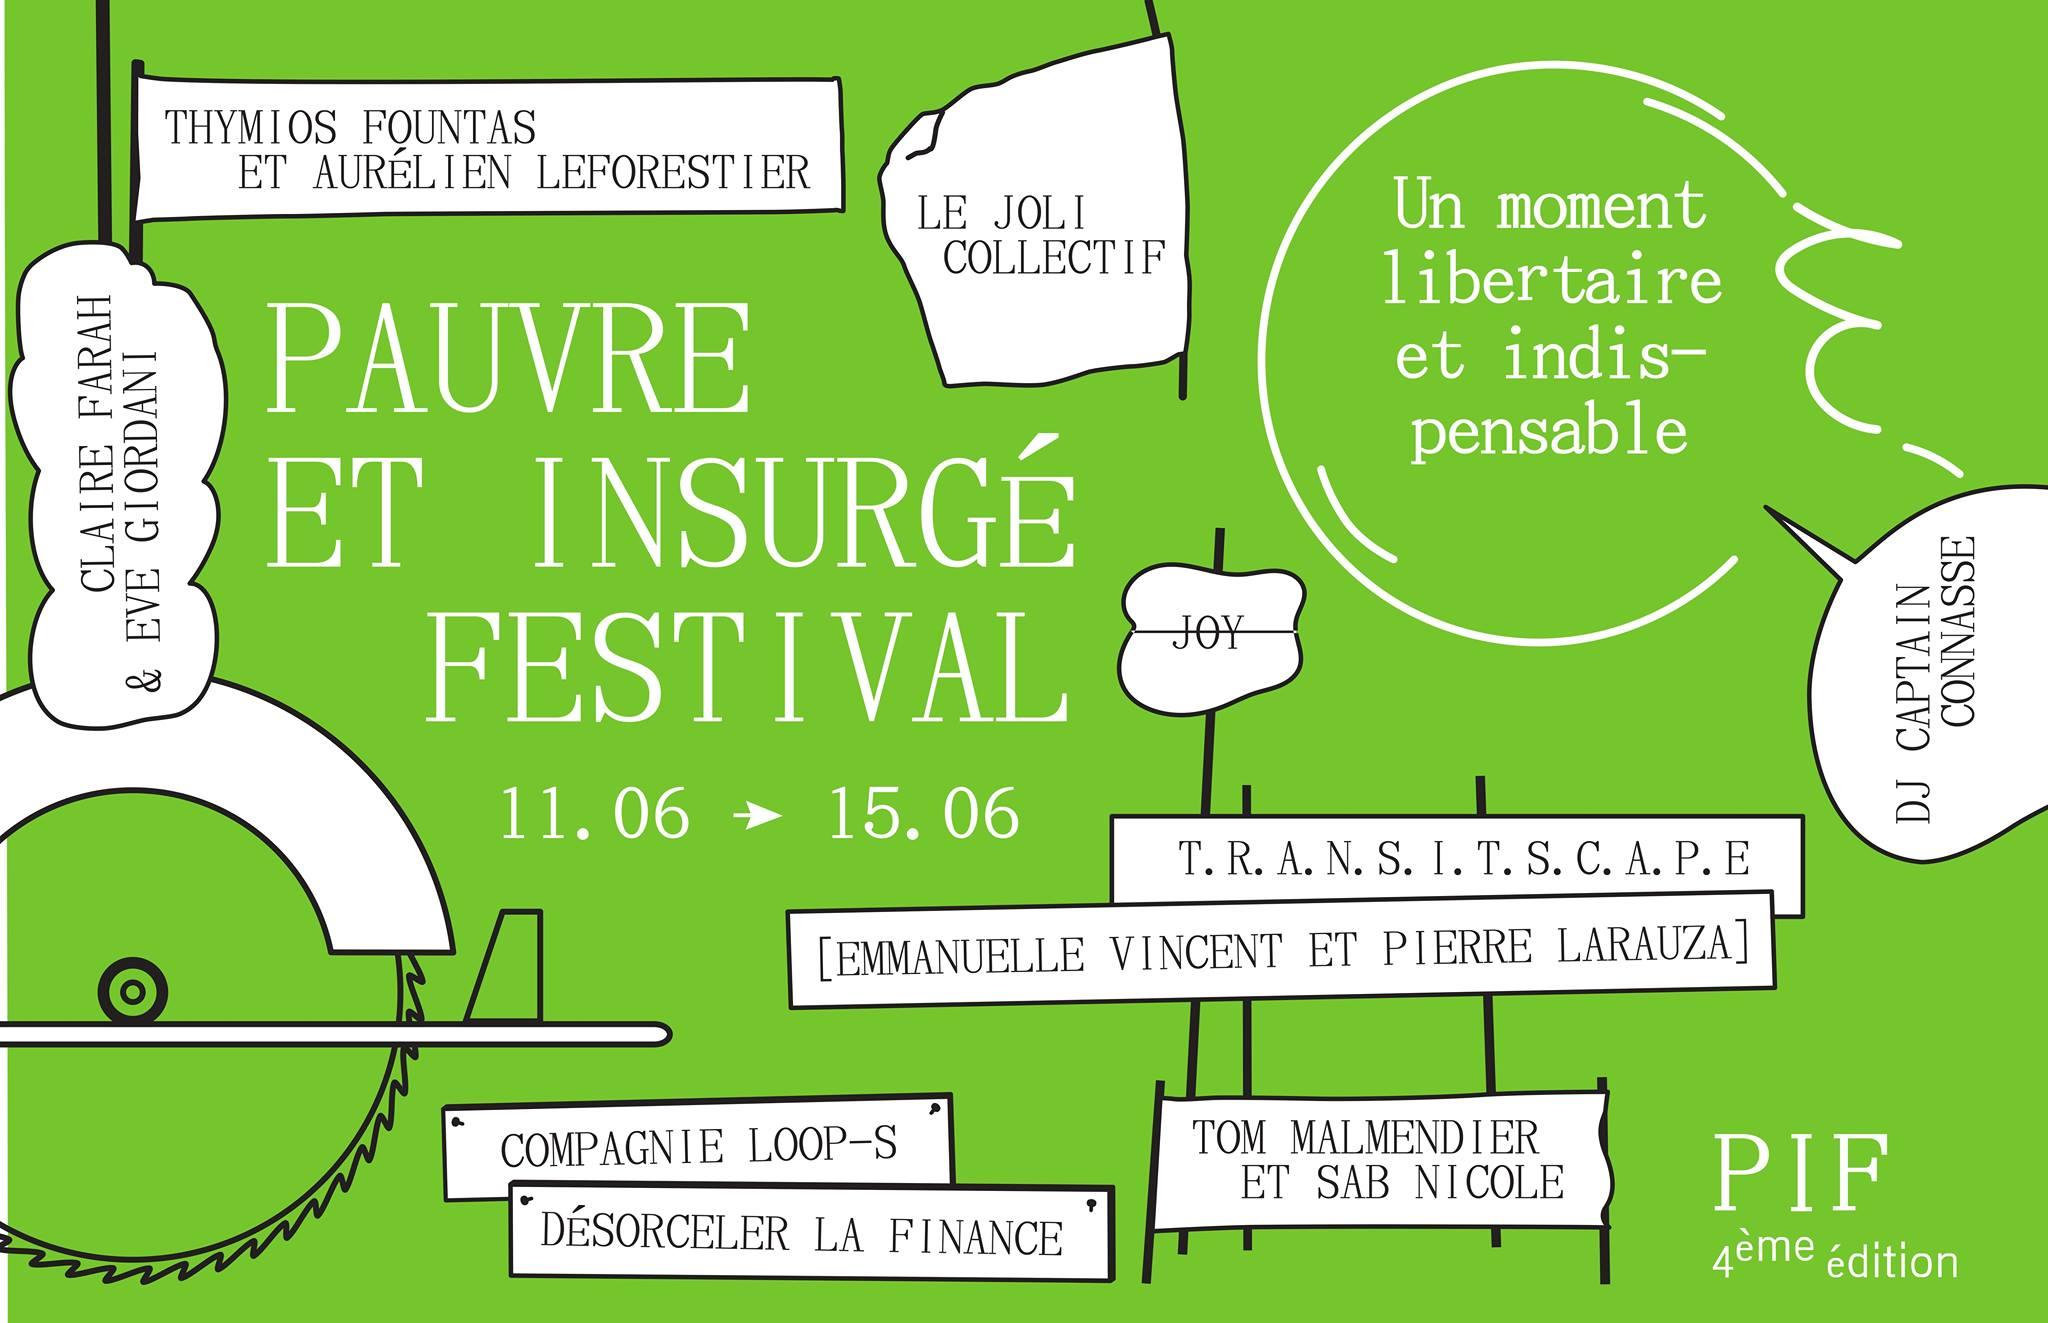 PIF Festival - Basalmine